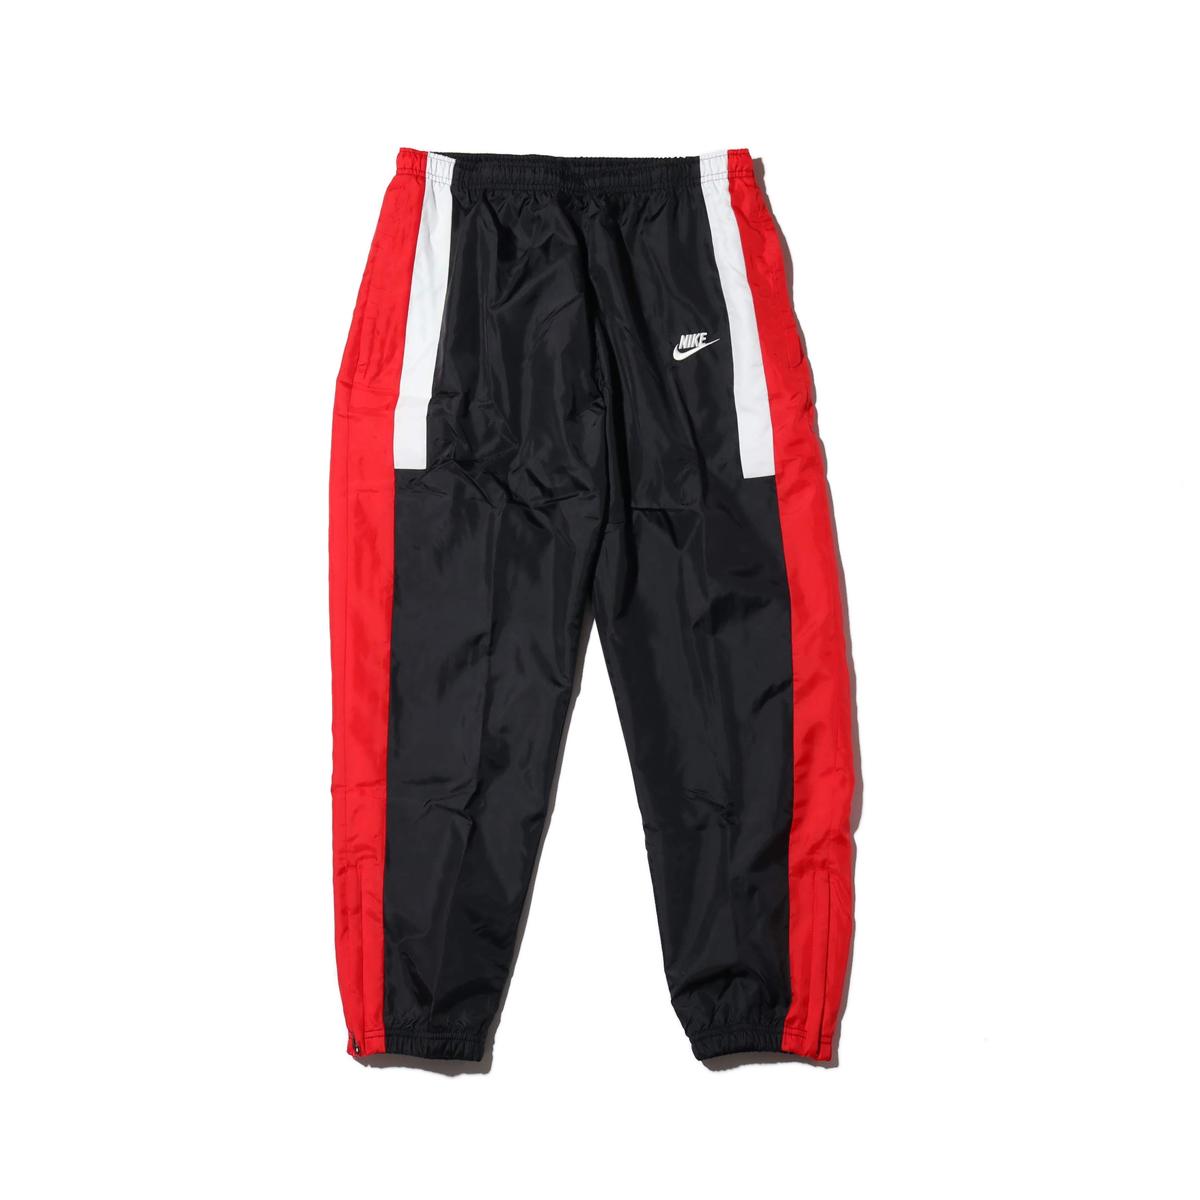 NIKE AS M NSW RE-ISSUE PANT WVN(ナイキ ウーブン リ イシュー パンツ)BLACK/UNIVERSITY RED/SUMMIT WHITE【メンズ パンツ】18HO-I